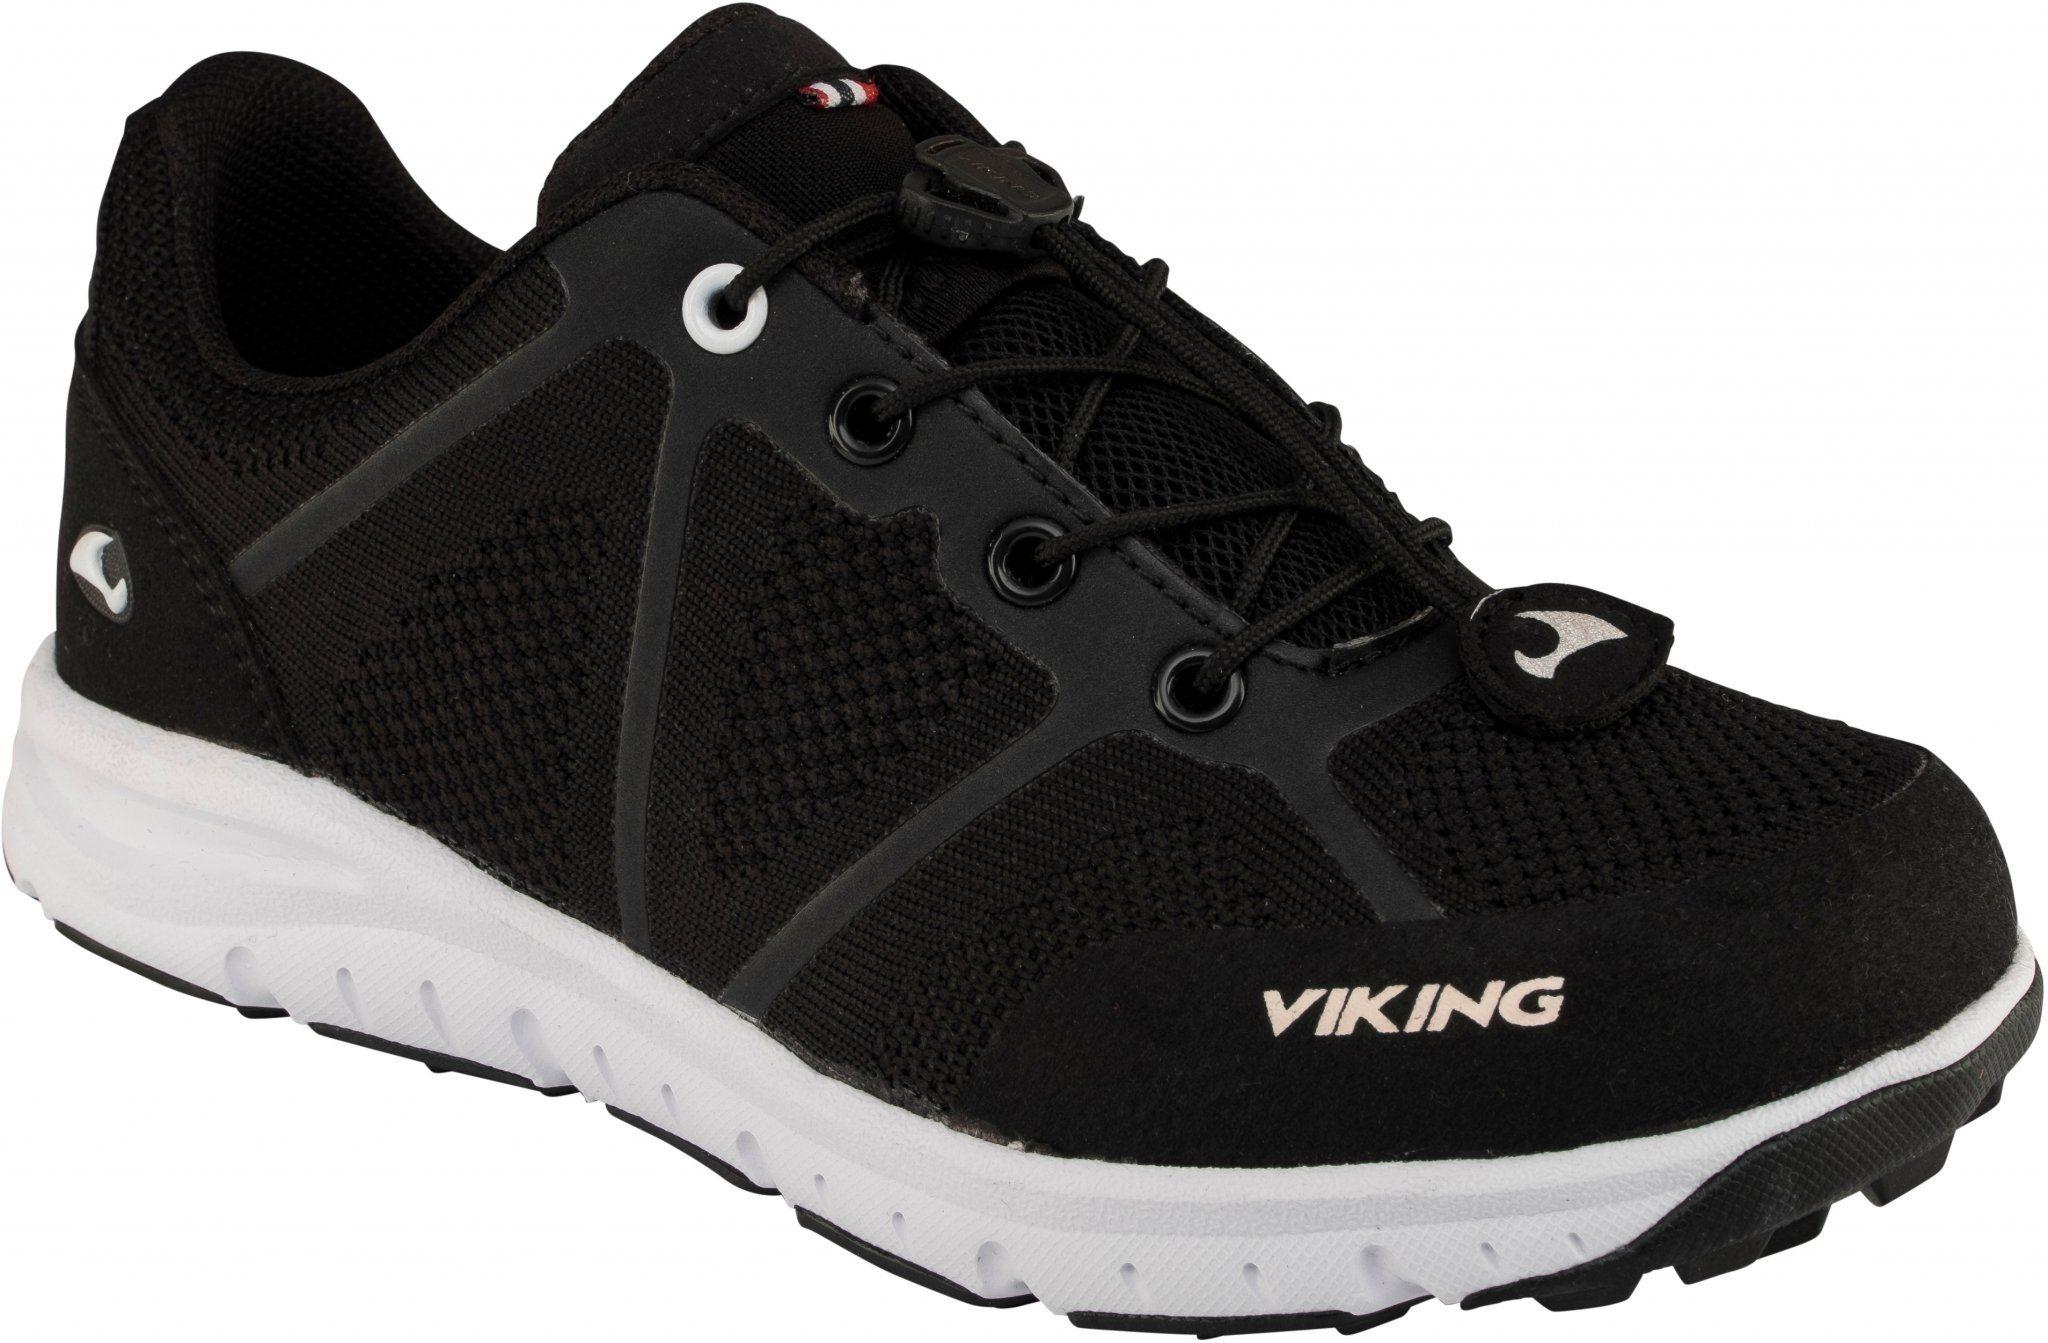 VIKING Kletterschuh »Viking Ullevaal Shoes Juniors«